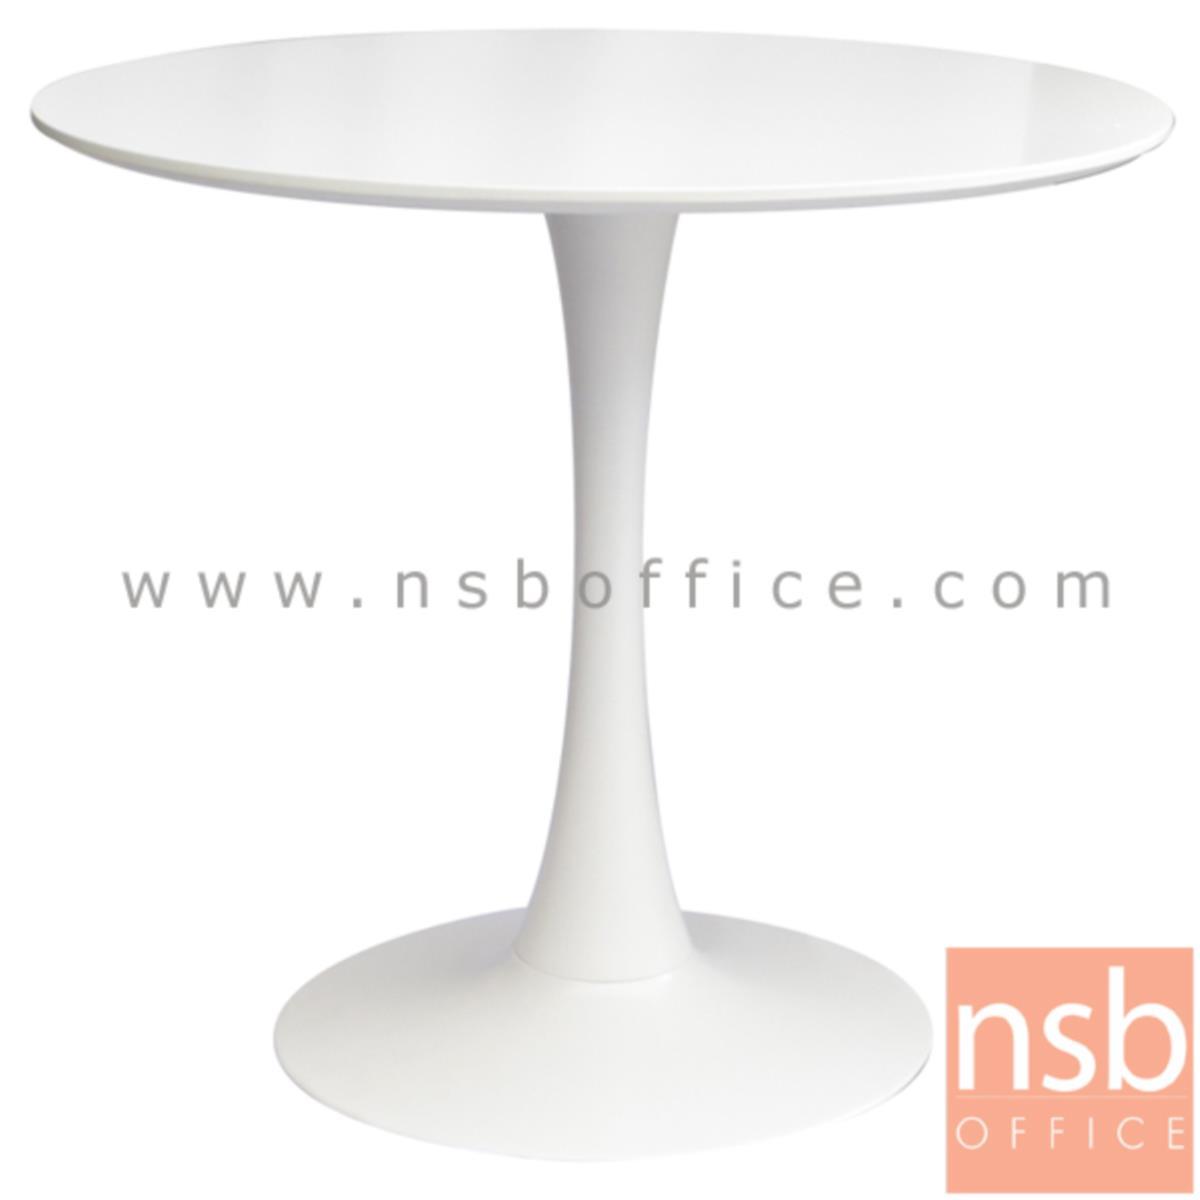 A14A163:โต๊ะหน้าพลาสติก รุ่น Jadeen (จาดีน) ขนาด 80Di cm.  ขาพลาสติกล้วน(PP)